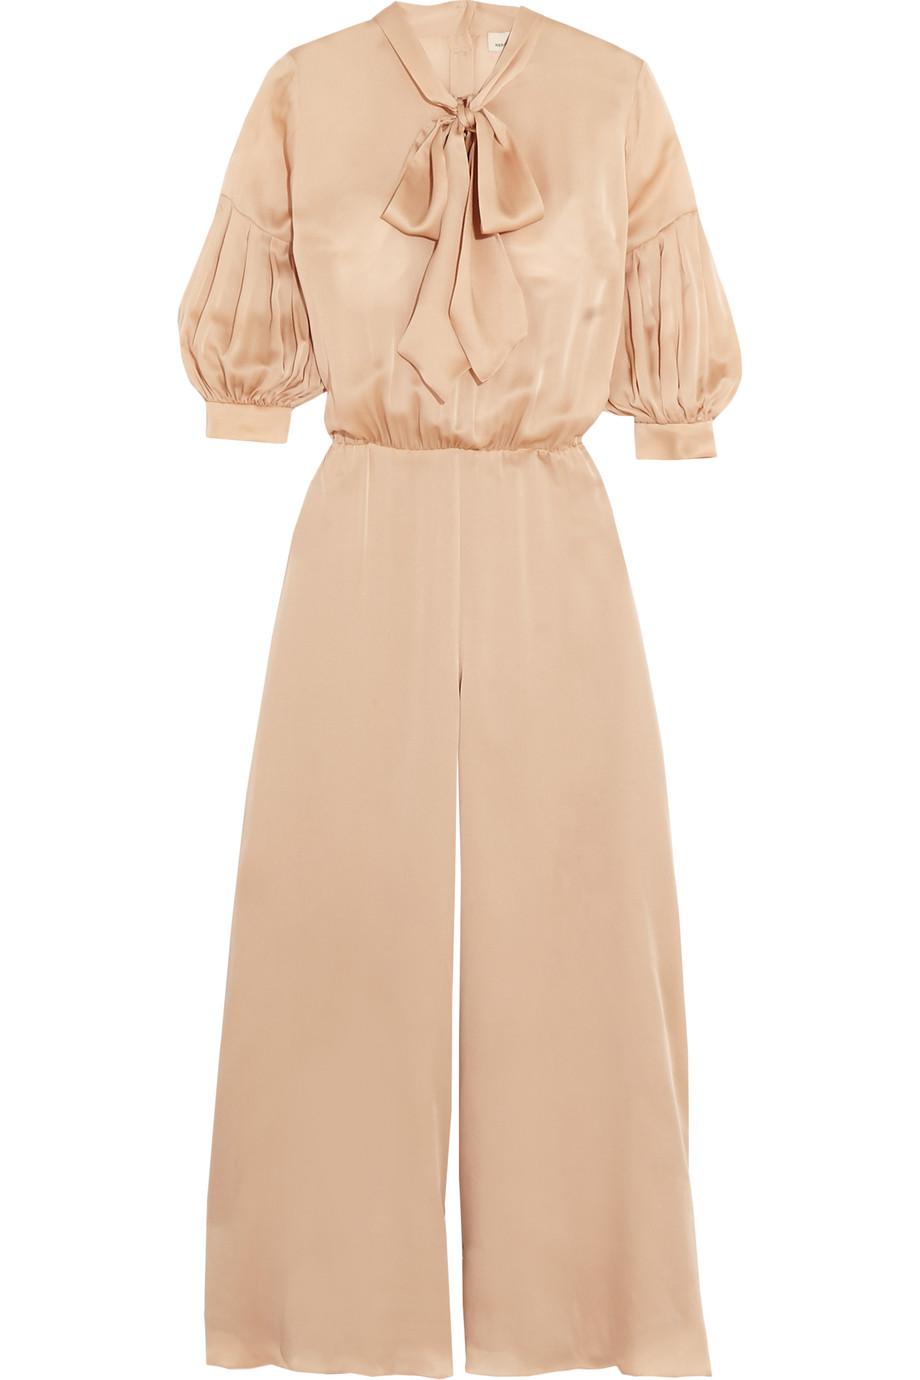 Pussy-Bow Silk-Satin Jumpsuit, Merchant Archive, Neutral, Women's, Size: 10